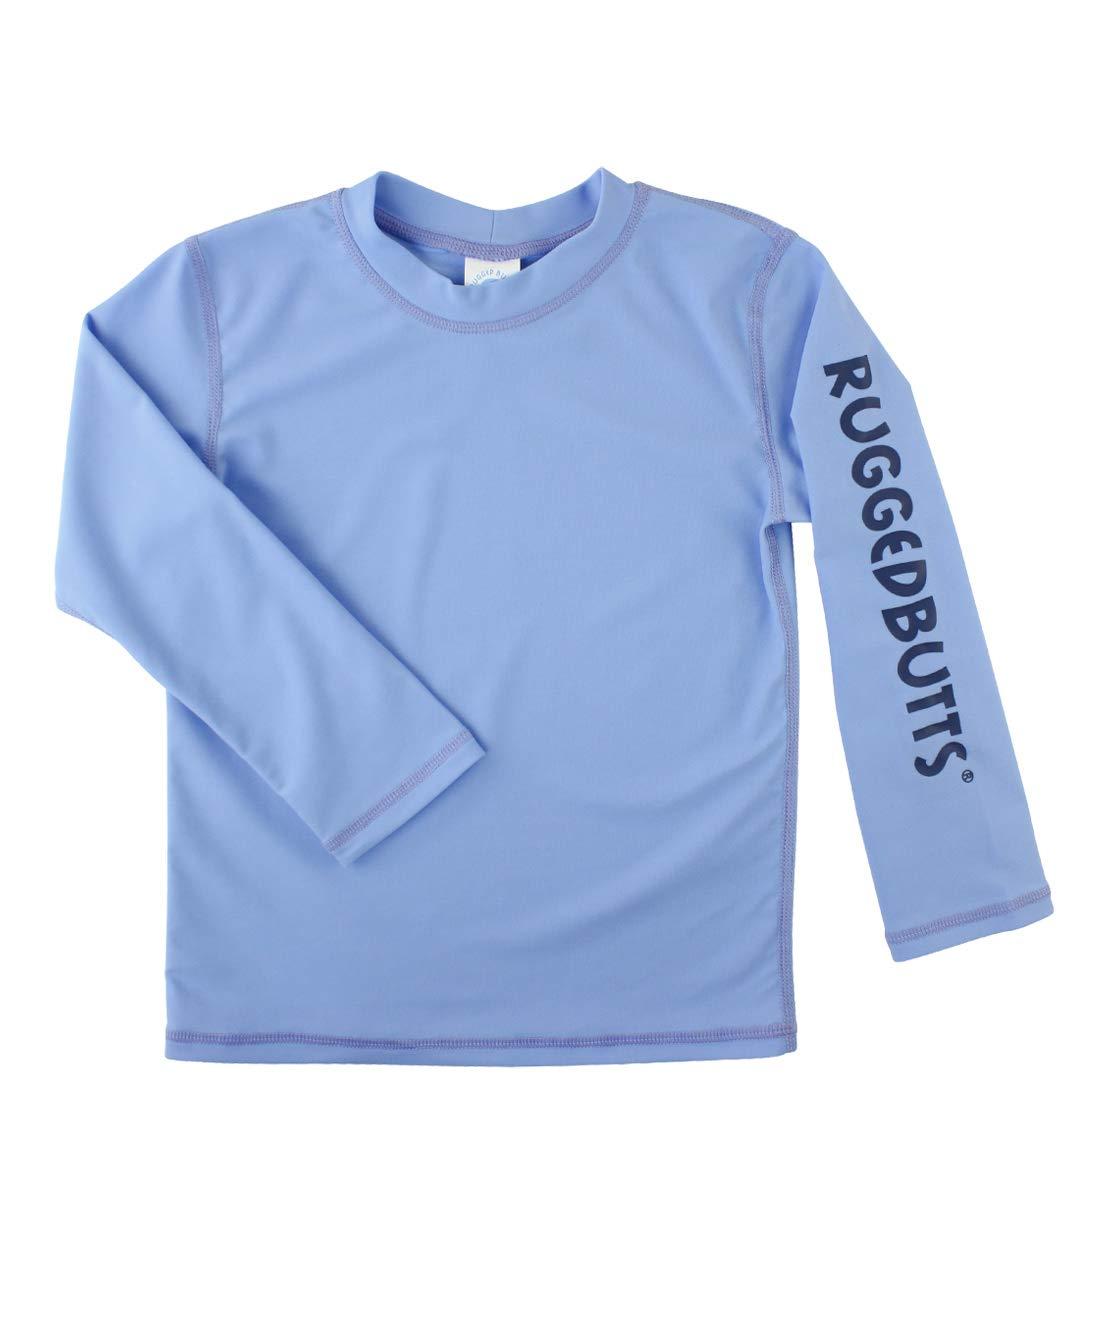 RuggedButts Baby/Toddler Boys Cornflower Blue Logo Long Sleeve Rash Guard - 12-18m by RuggedButts